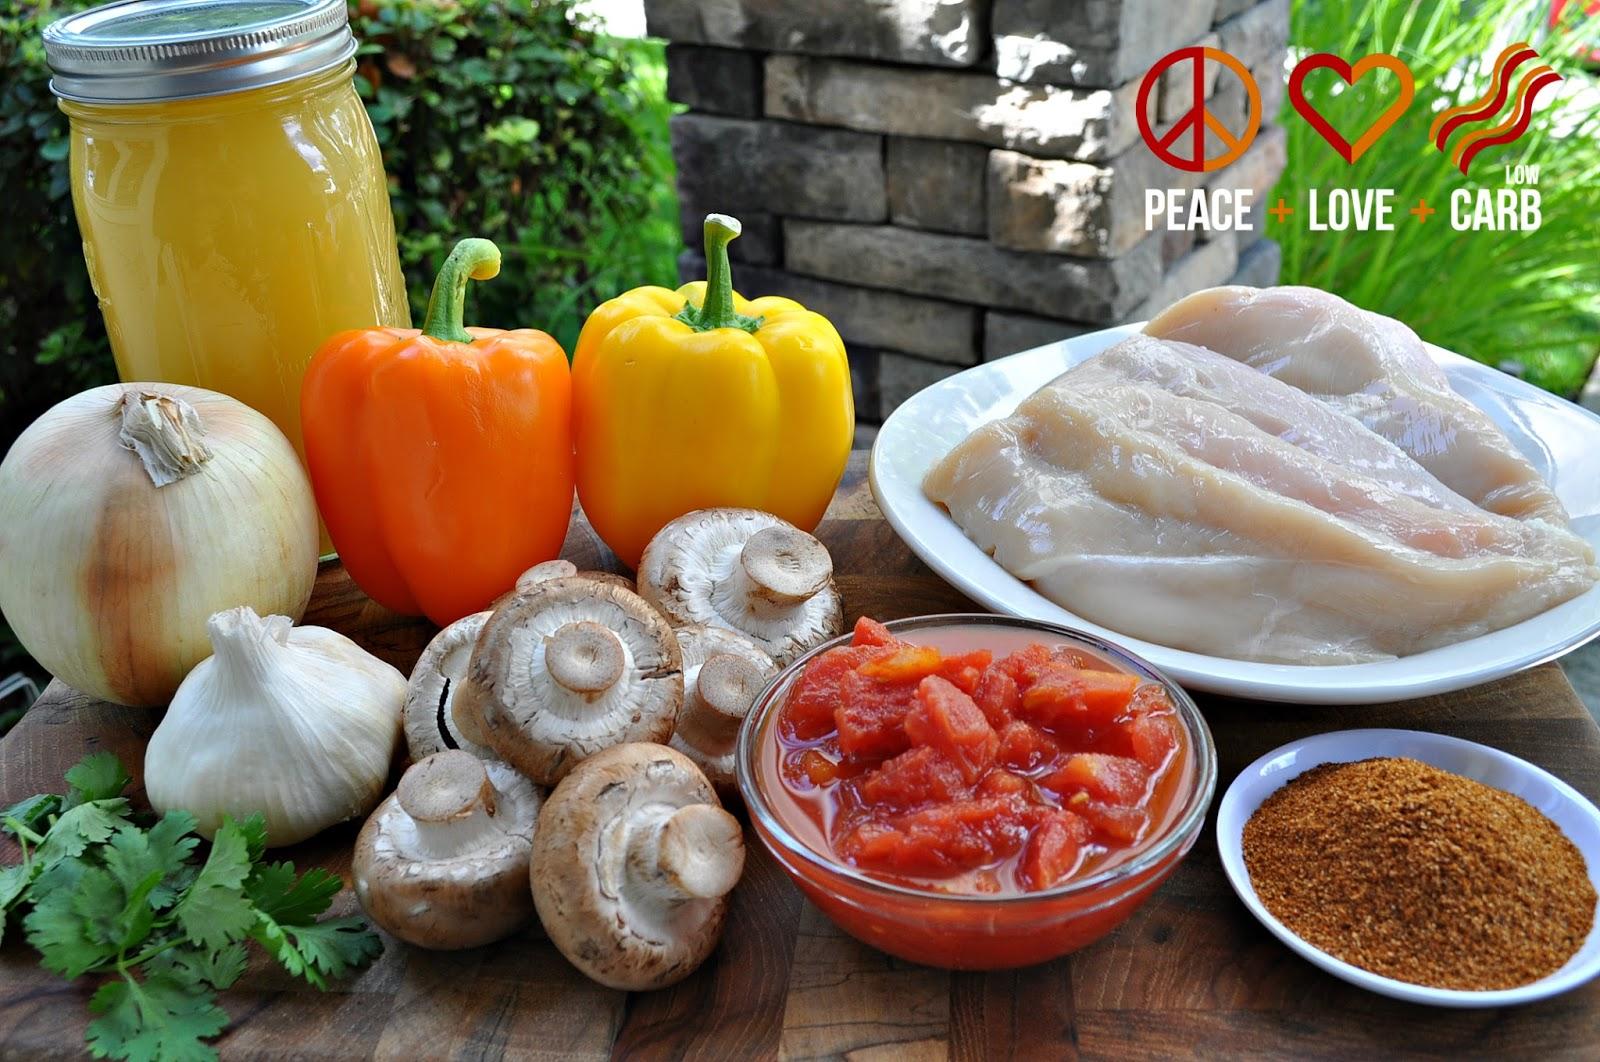 Chicken Fajita Soup - Low Carb, Paleo, Gluten Free